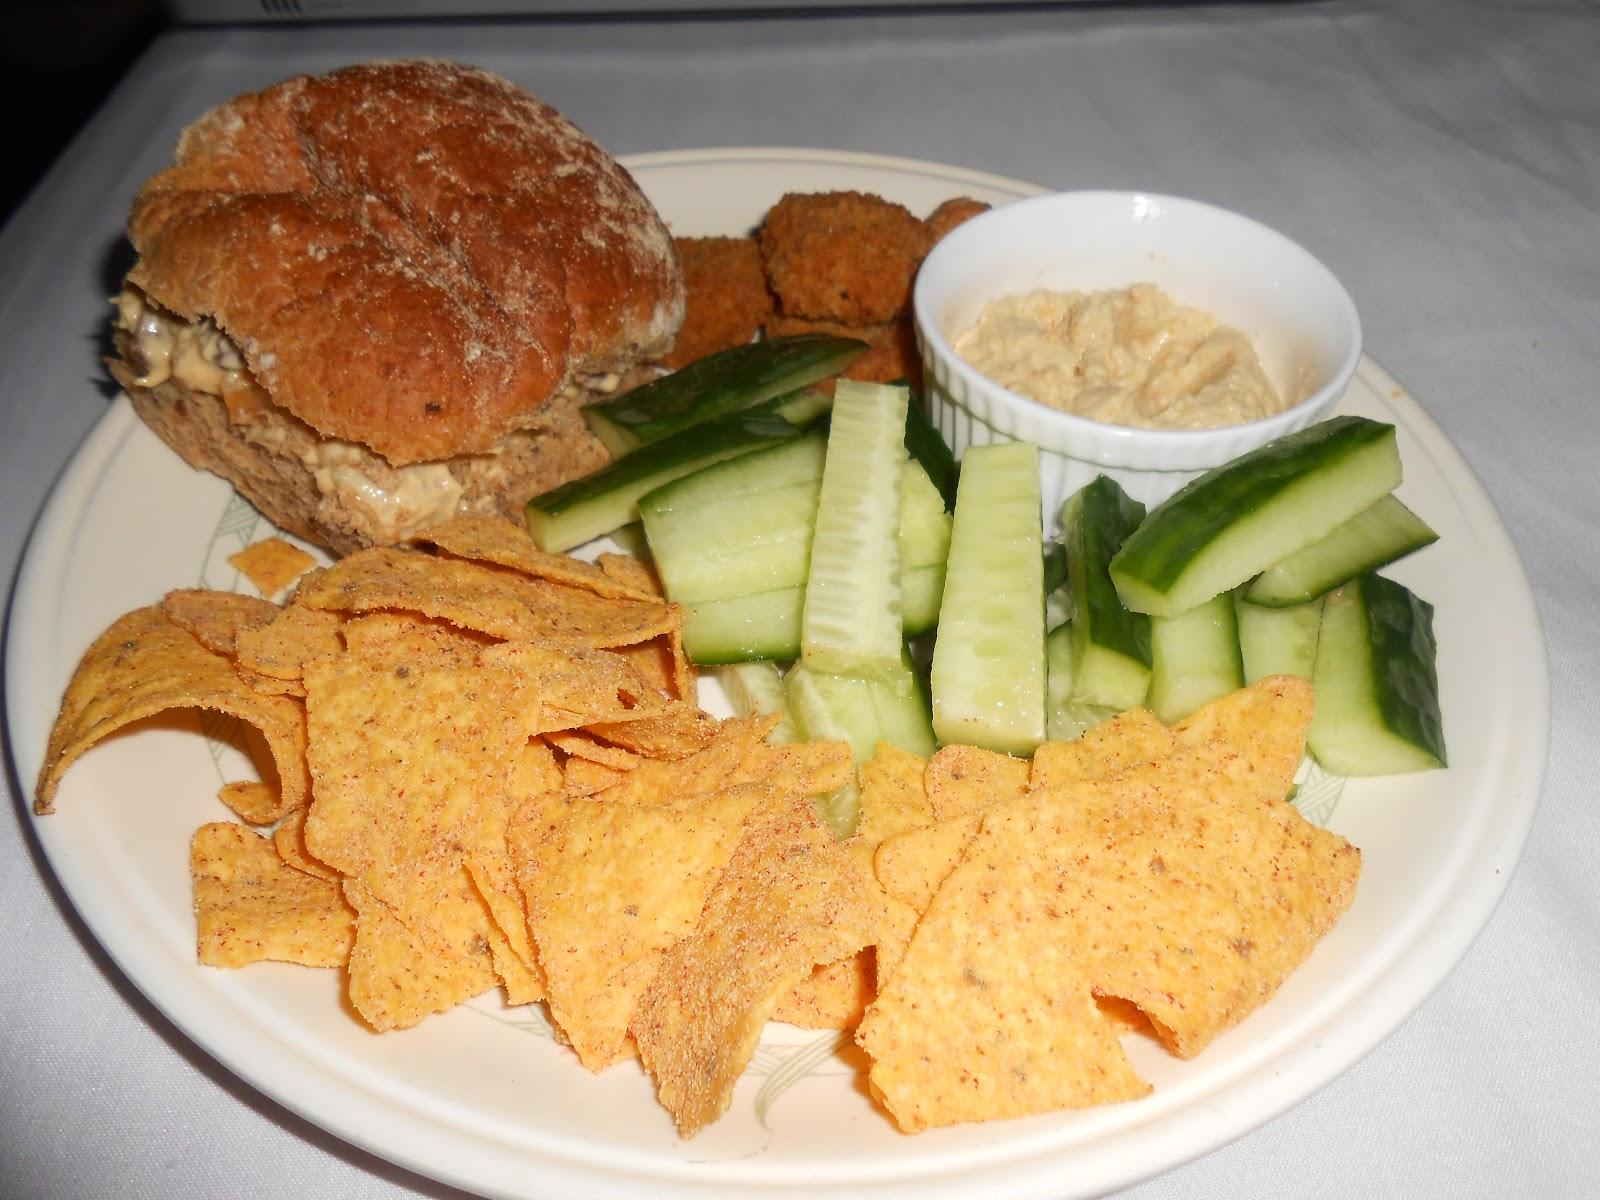 EmilyBelleBlogs: A healthyish Lunchtime feast :D